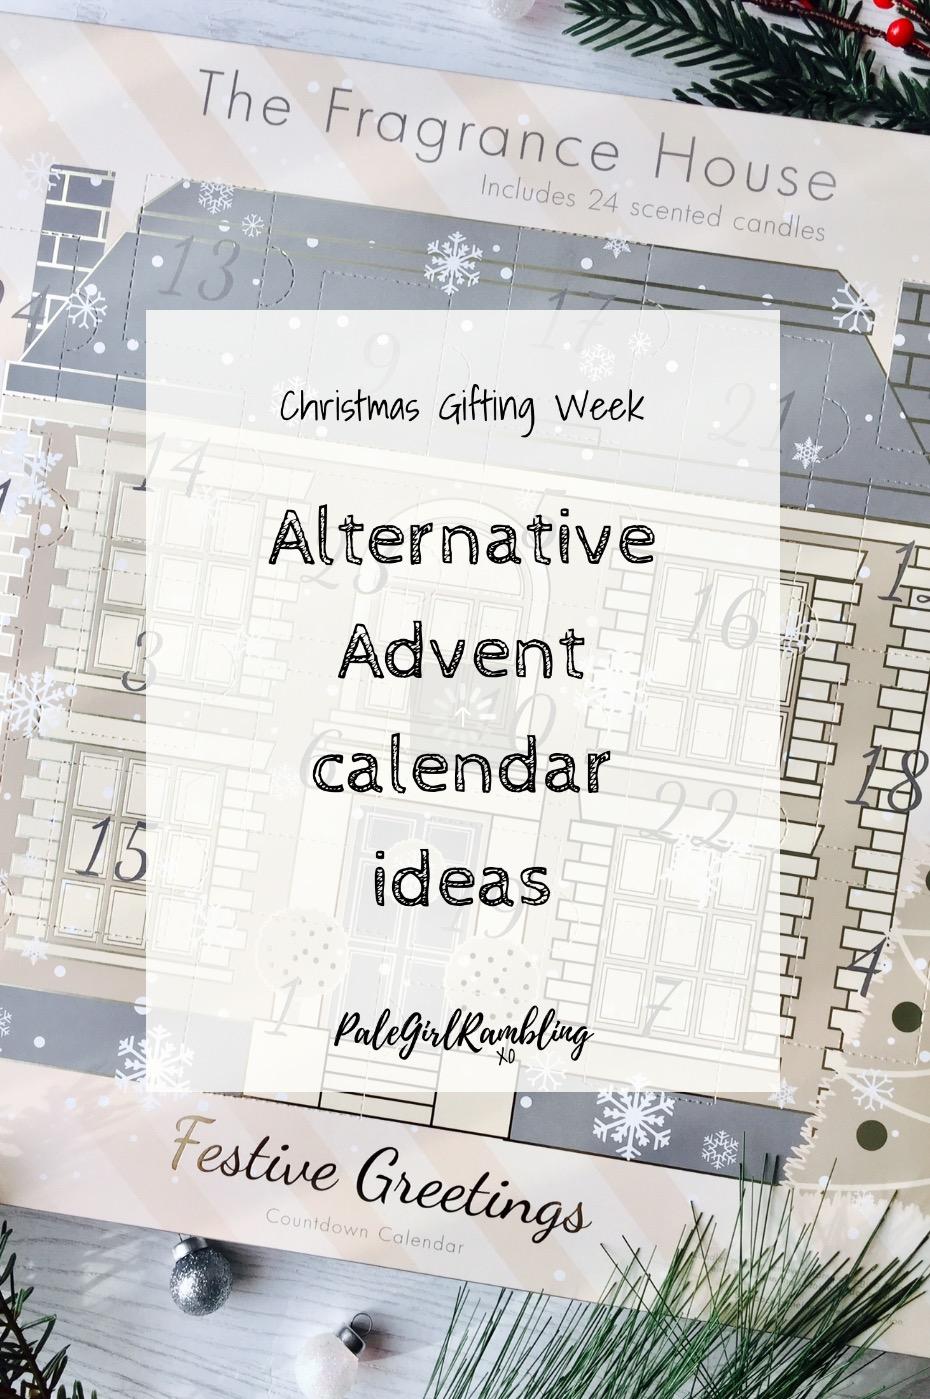 Perfume Click Advent calendar gift ideas Christmas discount